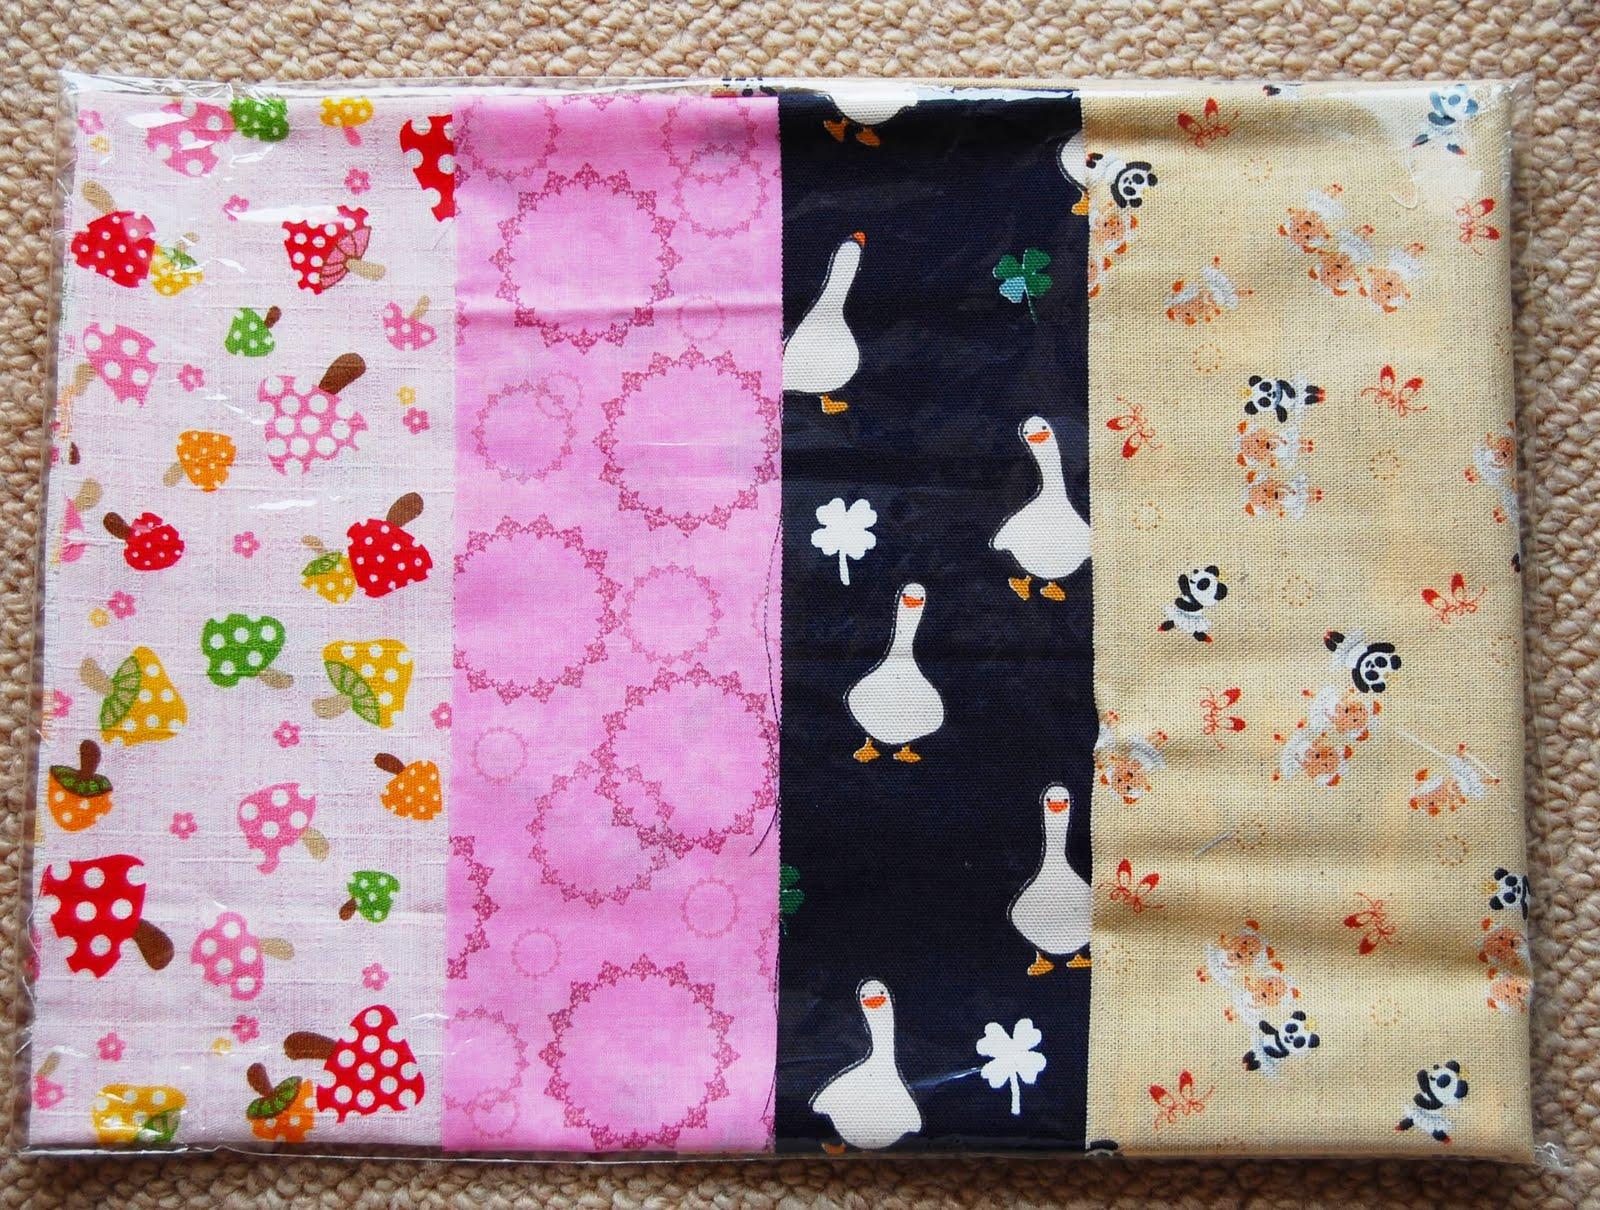 Mybotang fabric scrap series cards - 3 Code Name Fe3